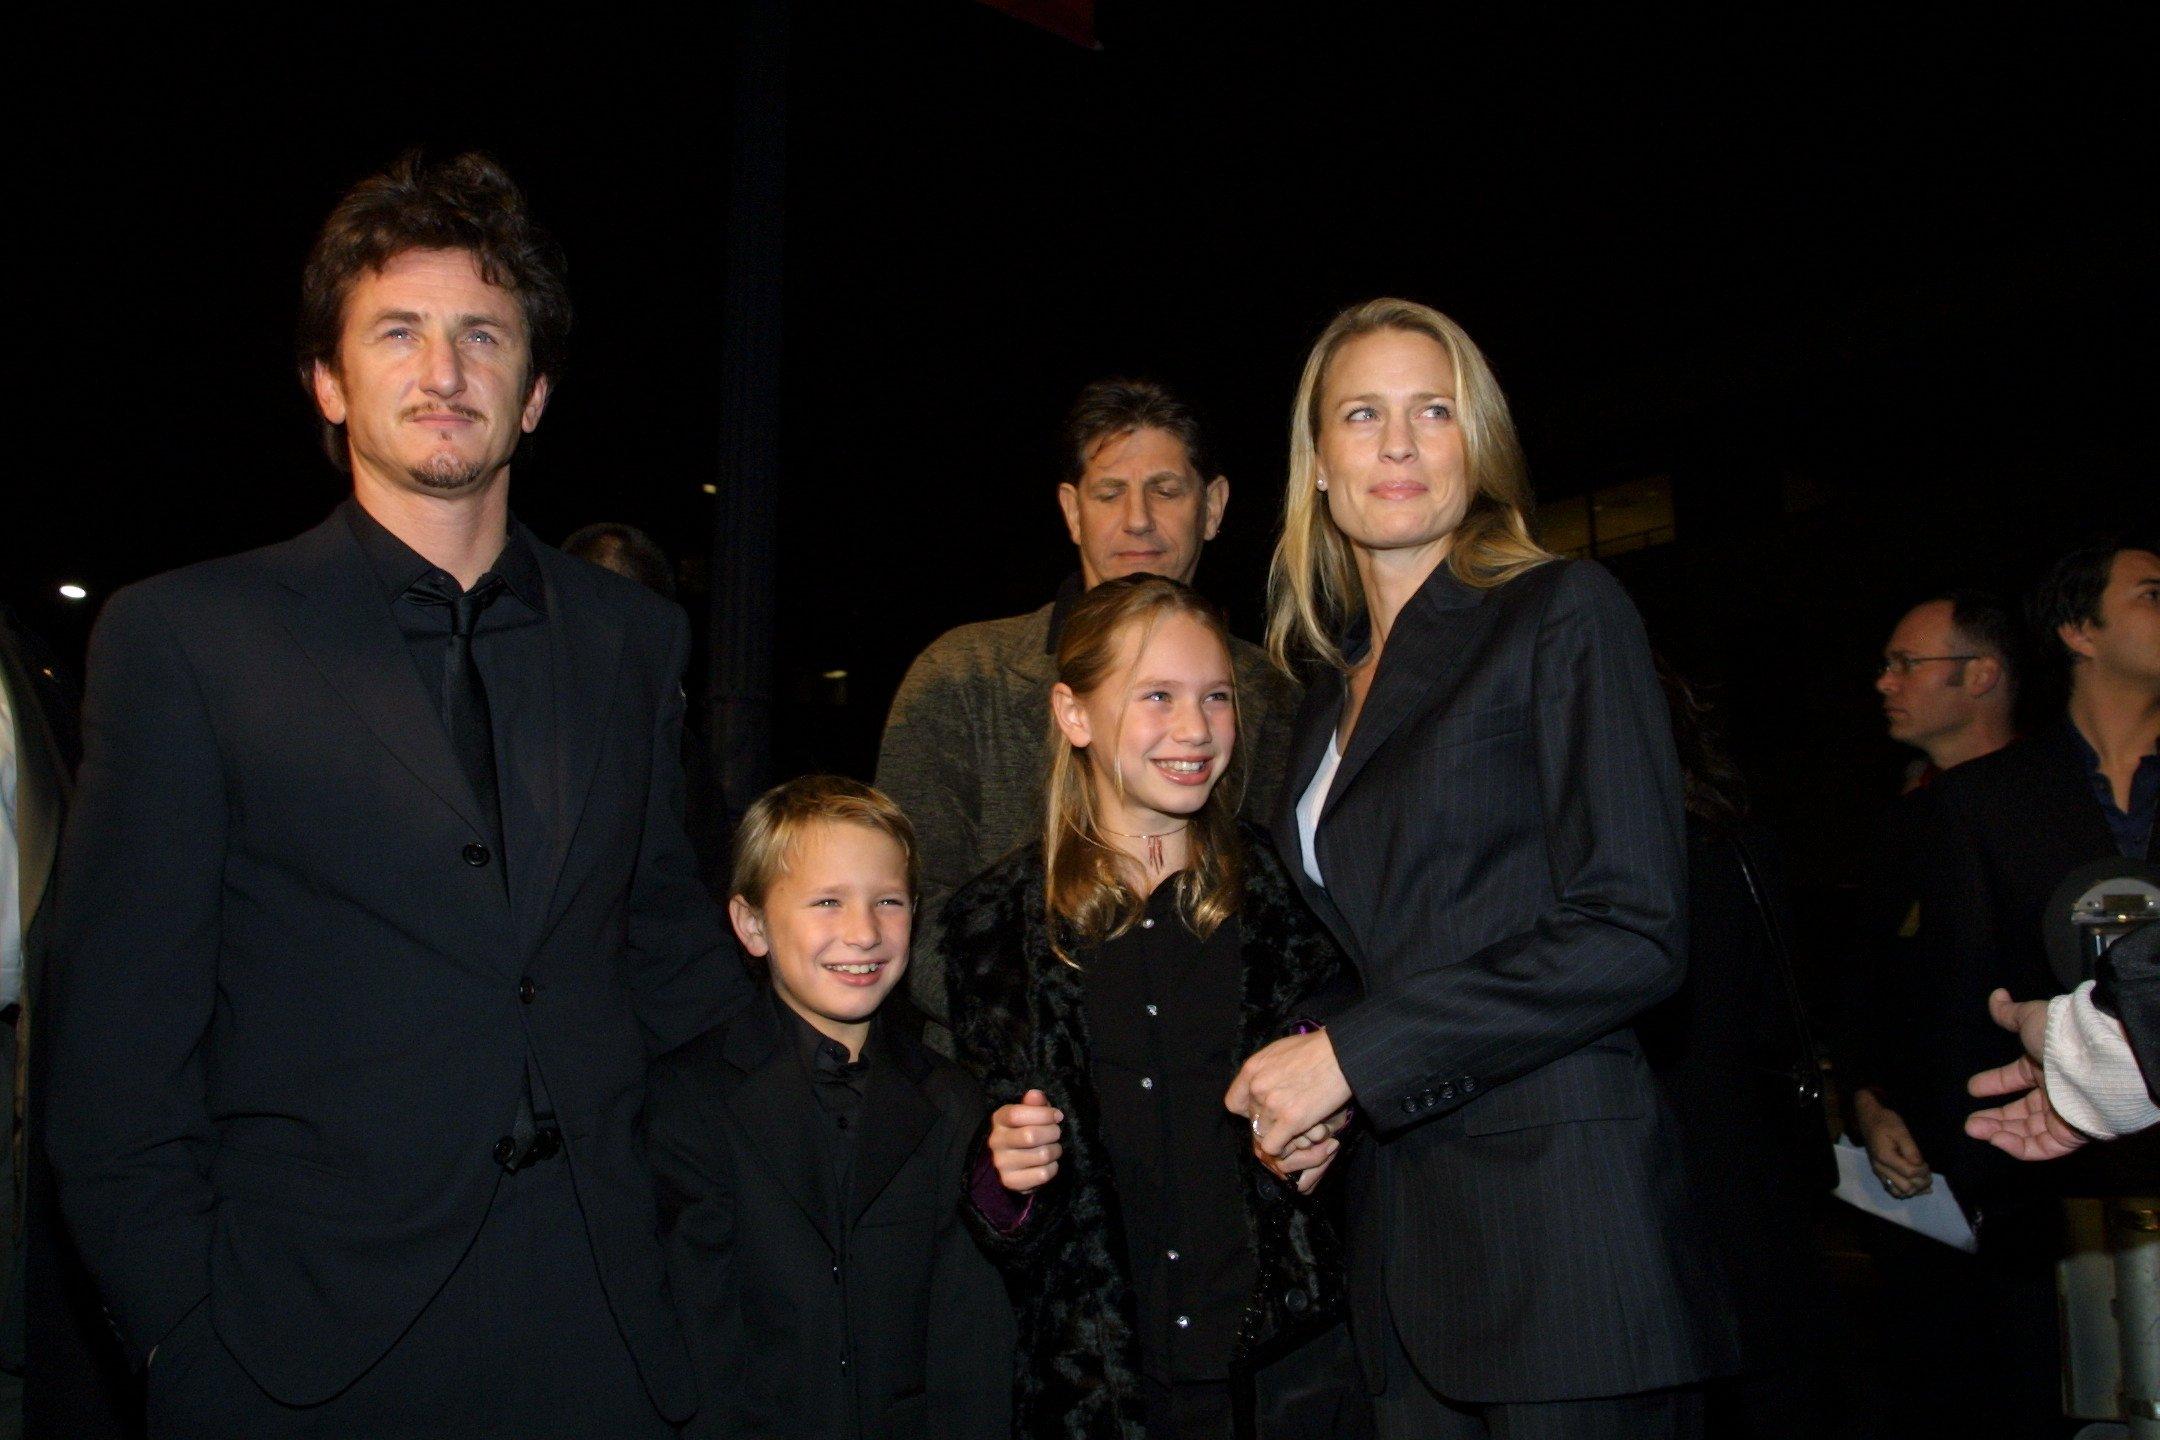 Sean Penn, Dylan Penn, Robin Wright, Hopper Penn